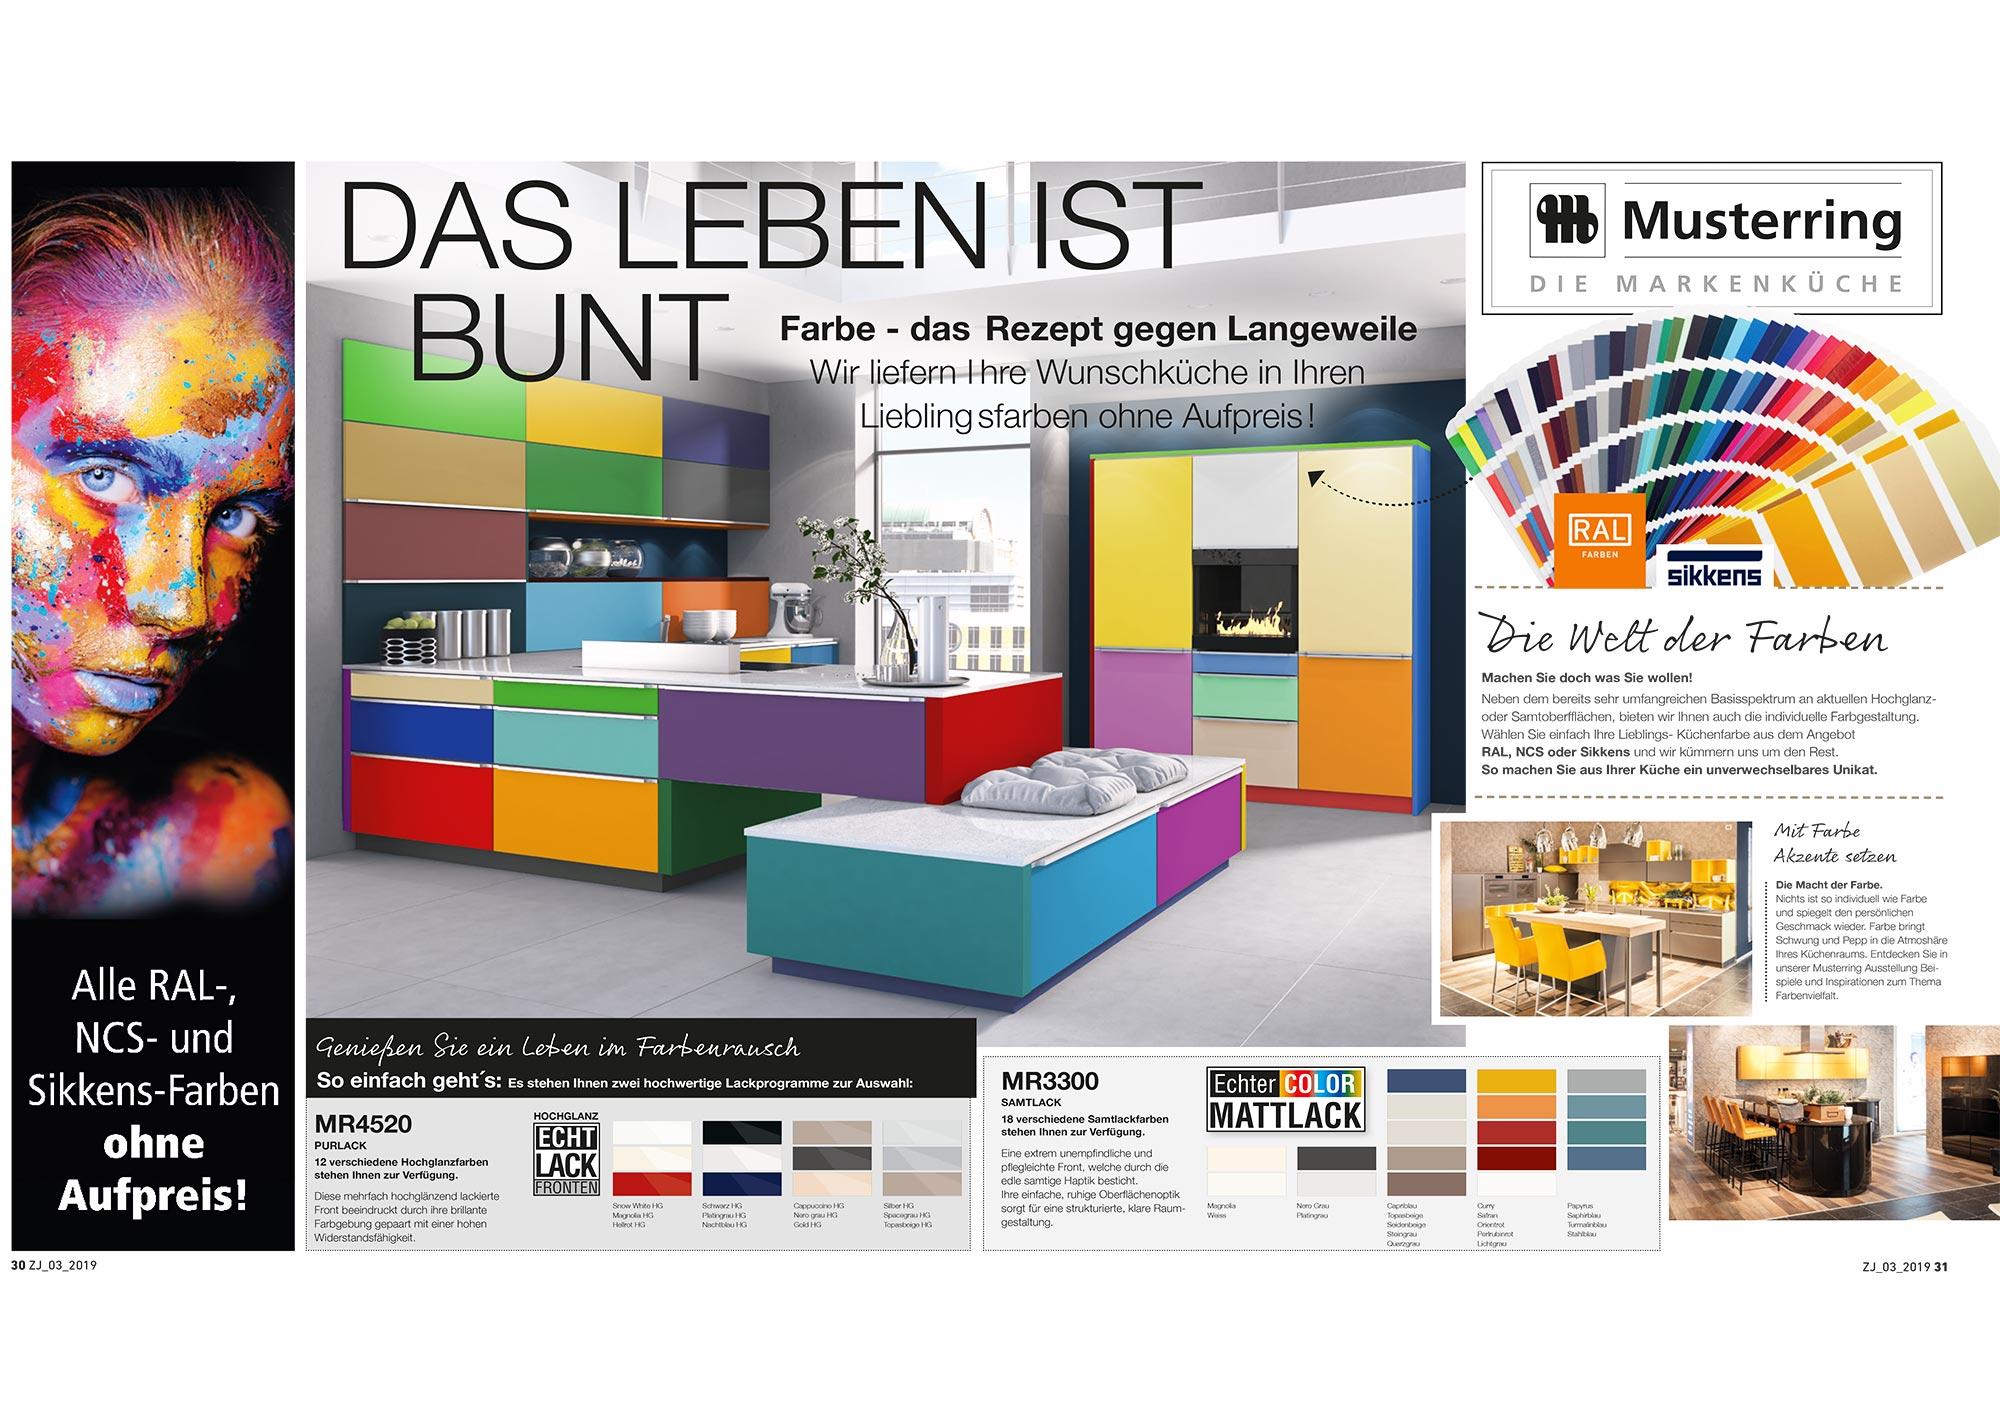 Kche Ebay Berlin Stunning Beautiful Ebay Kchen Zu